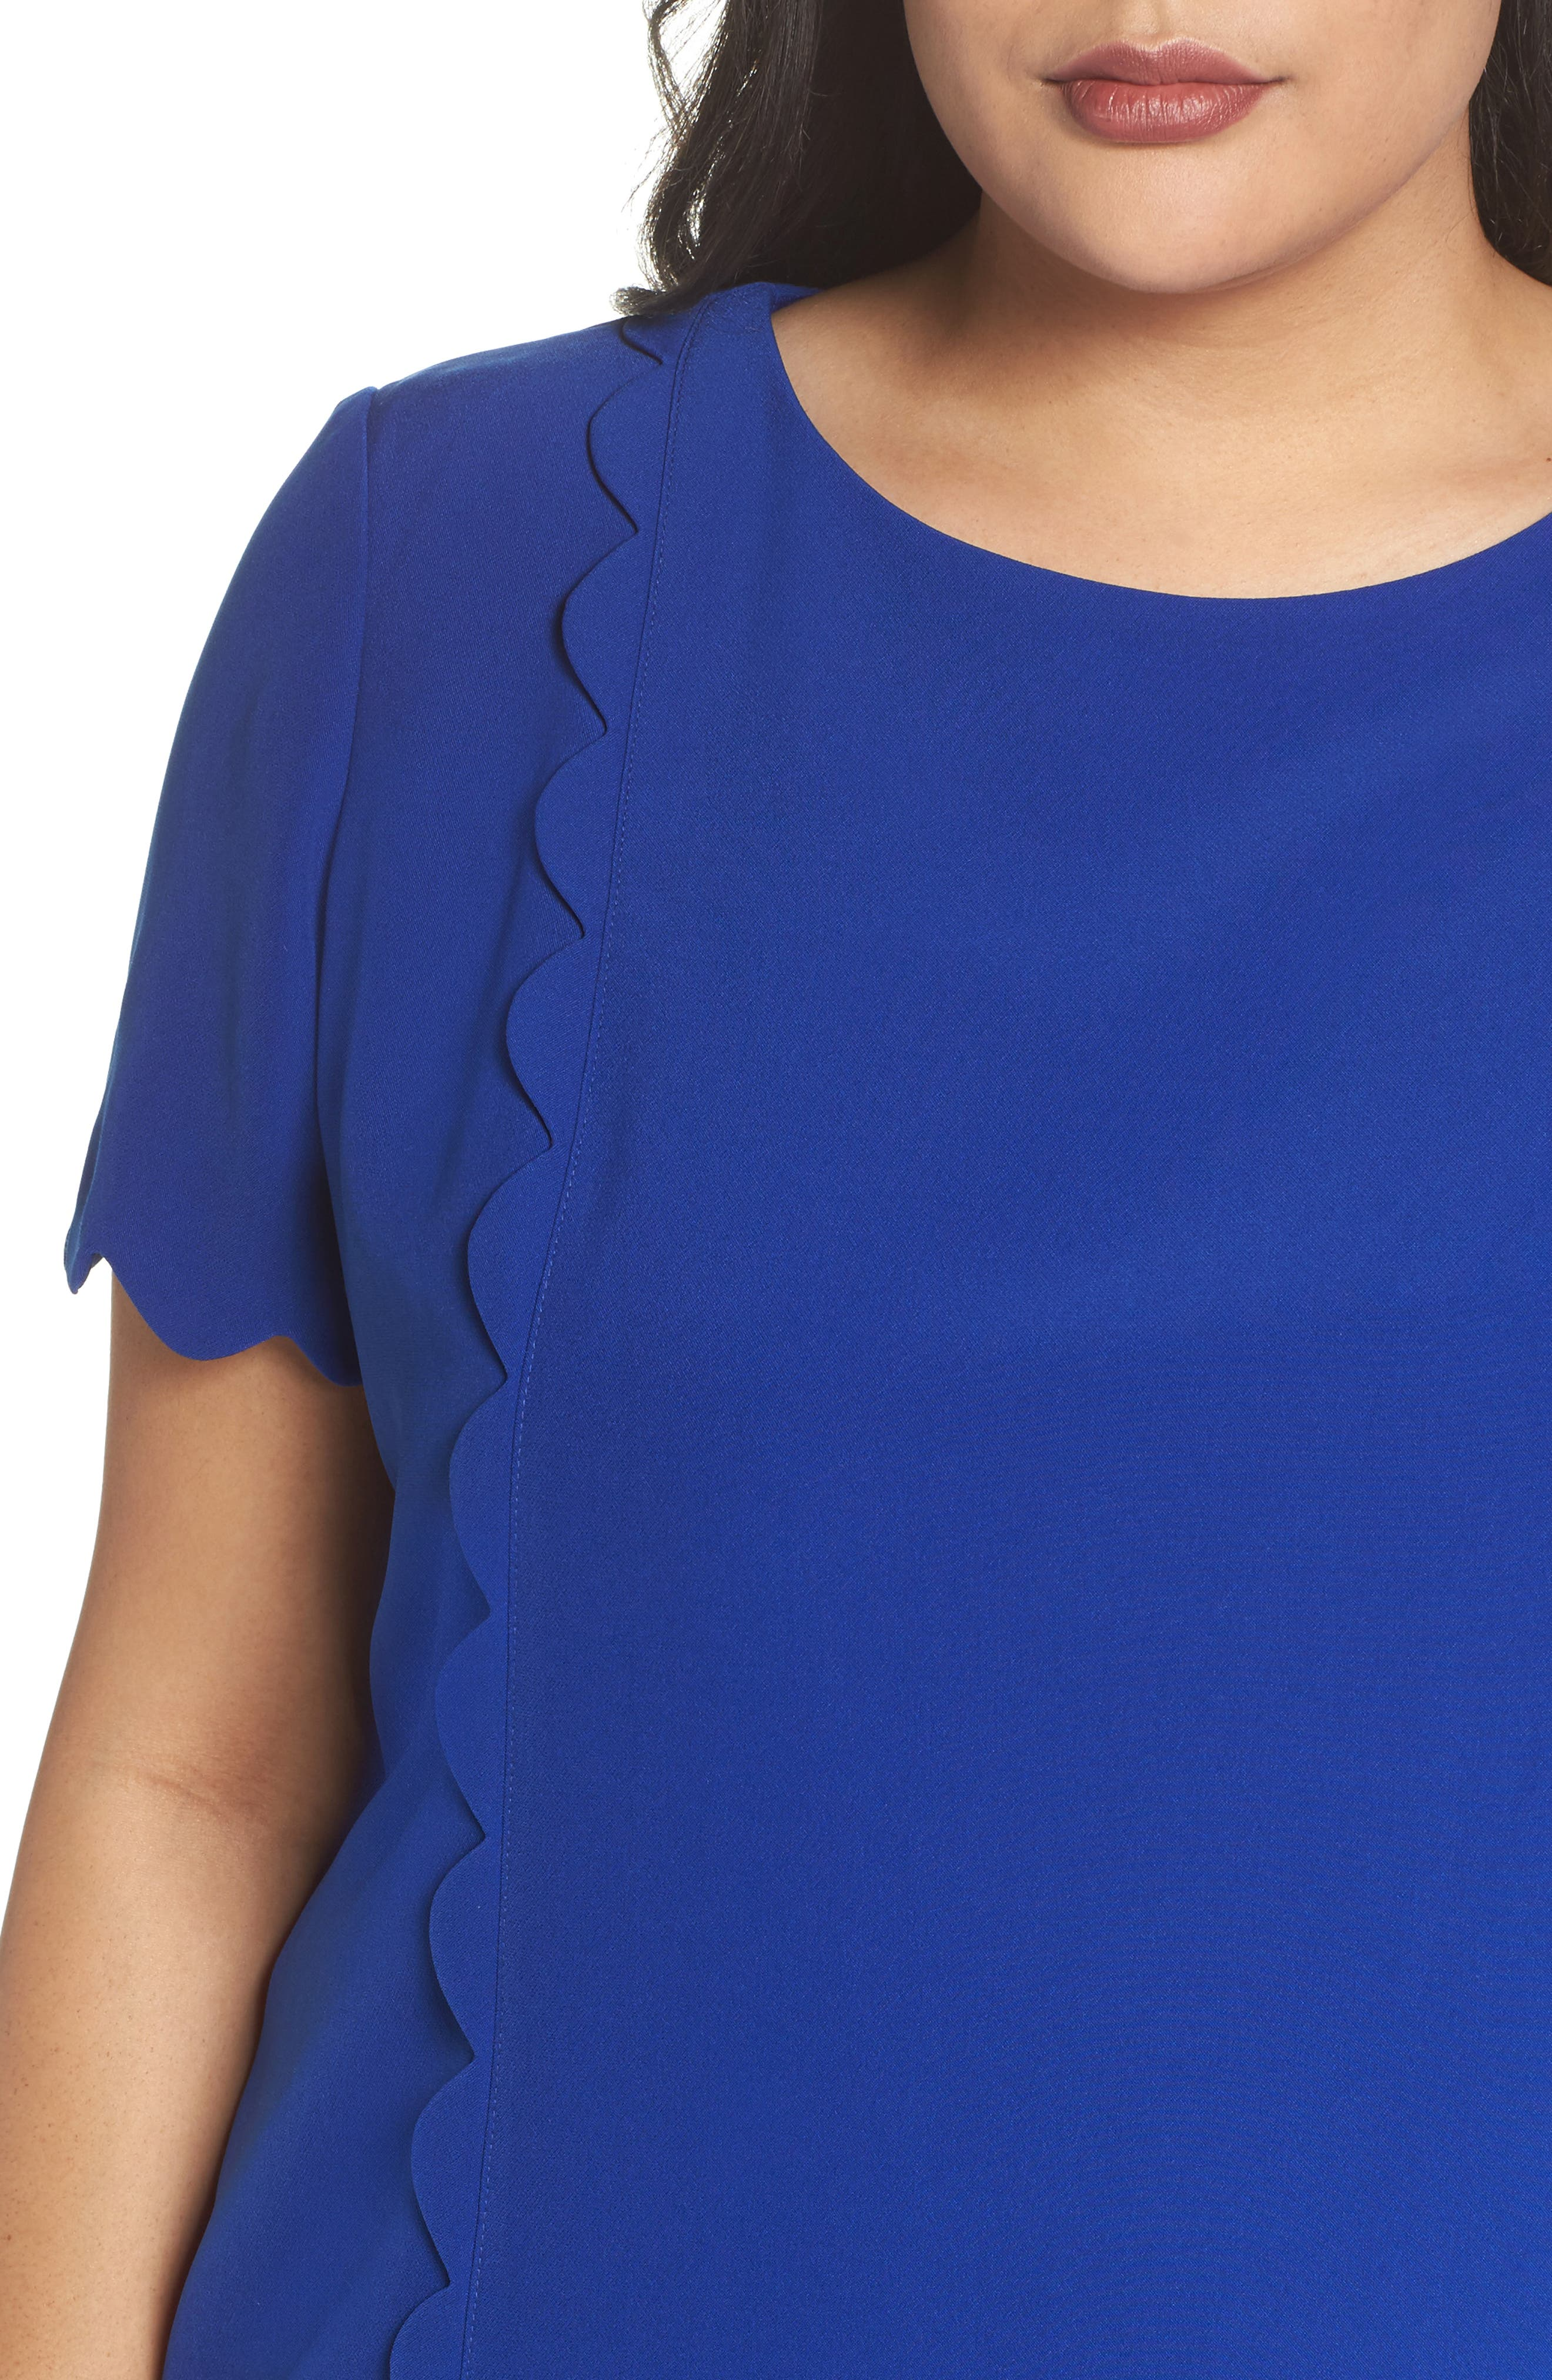 Scalloped Trim Shift Dress,                             Alternate thumbnail 4, color,